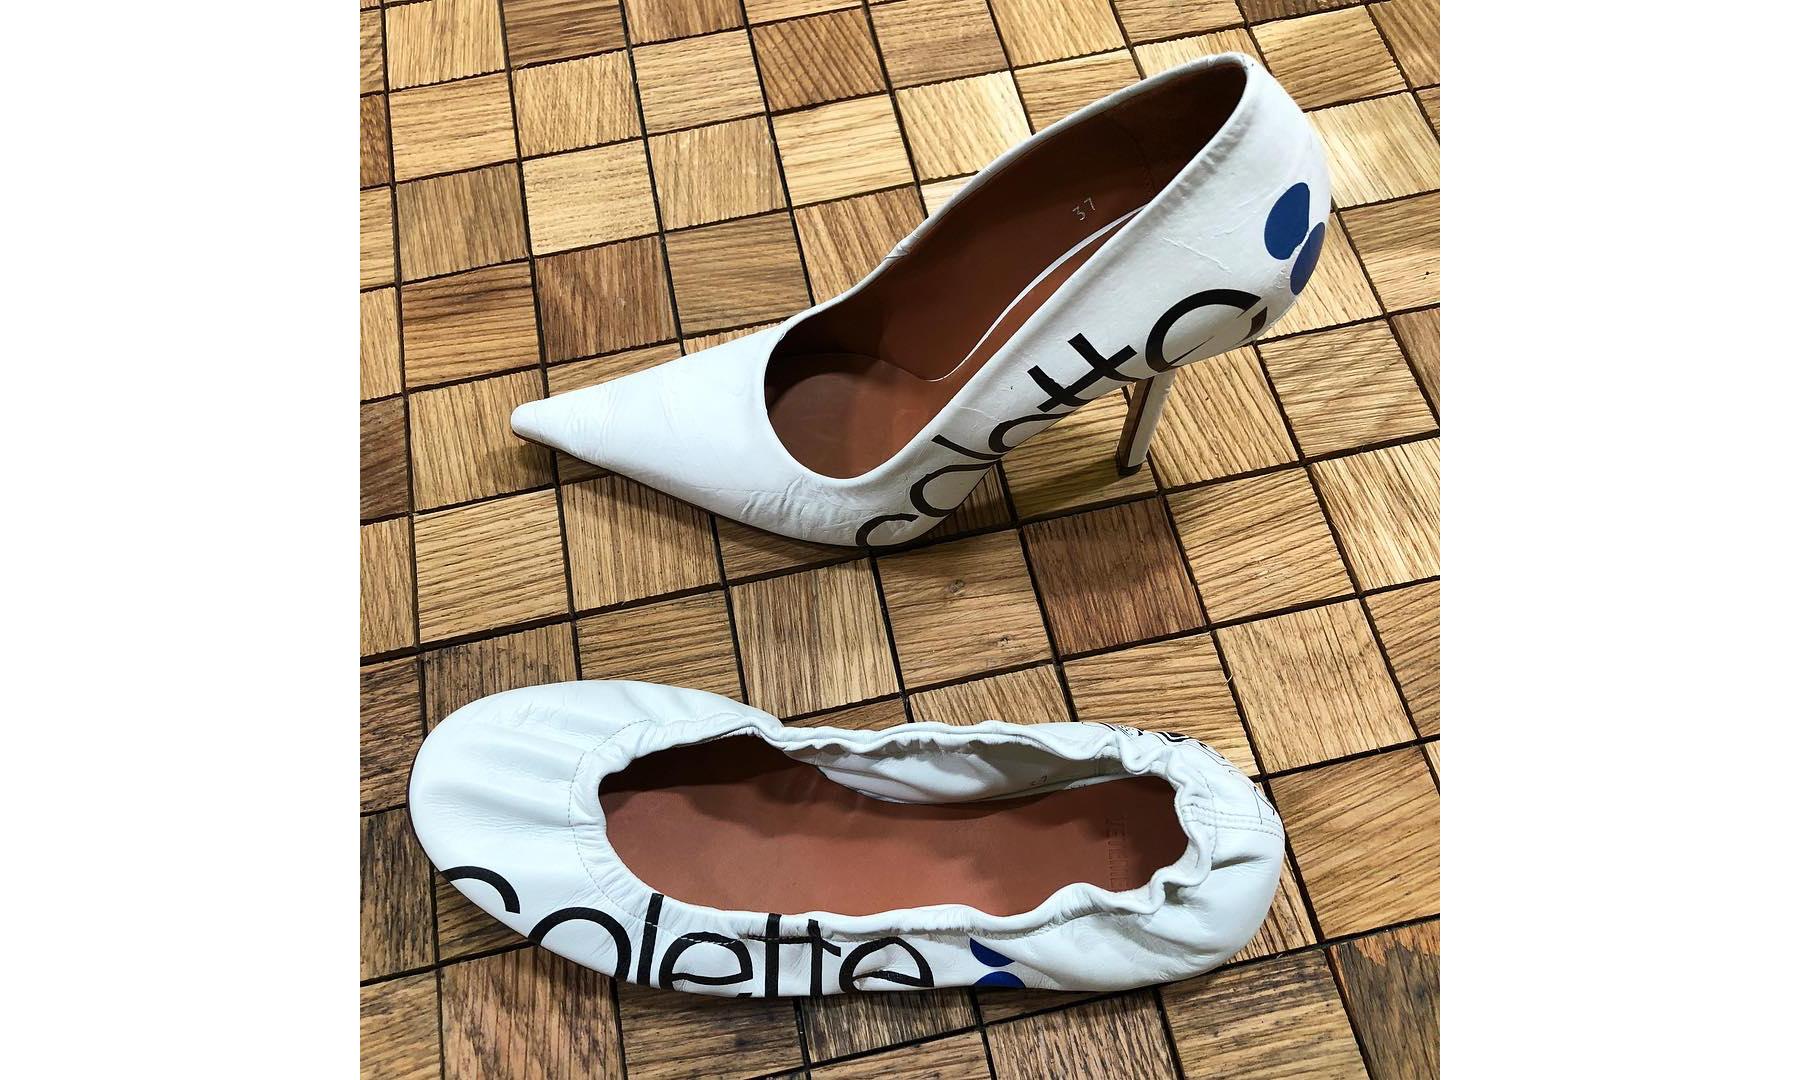 Vetements x colette 鞋履系列曝光